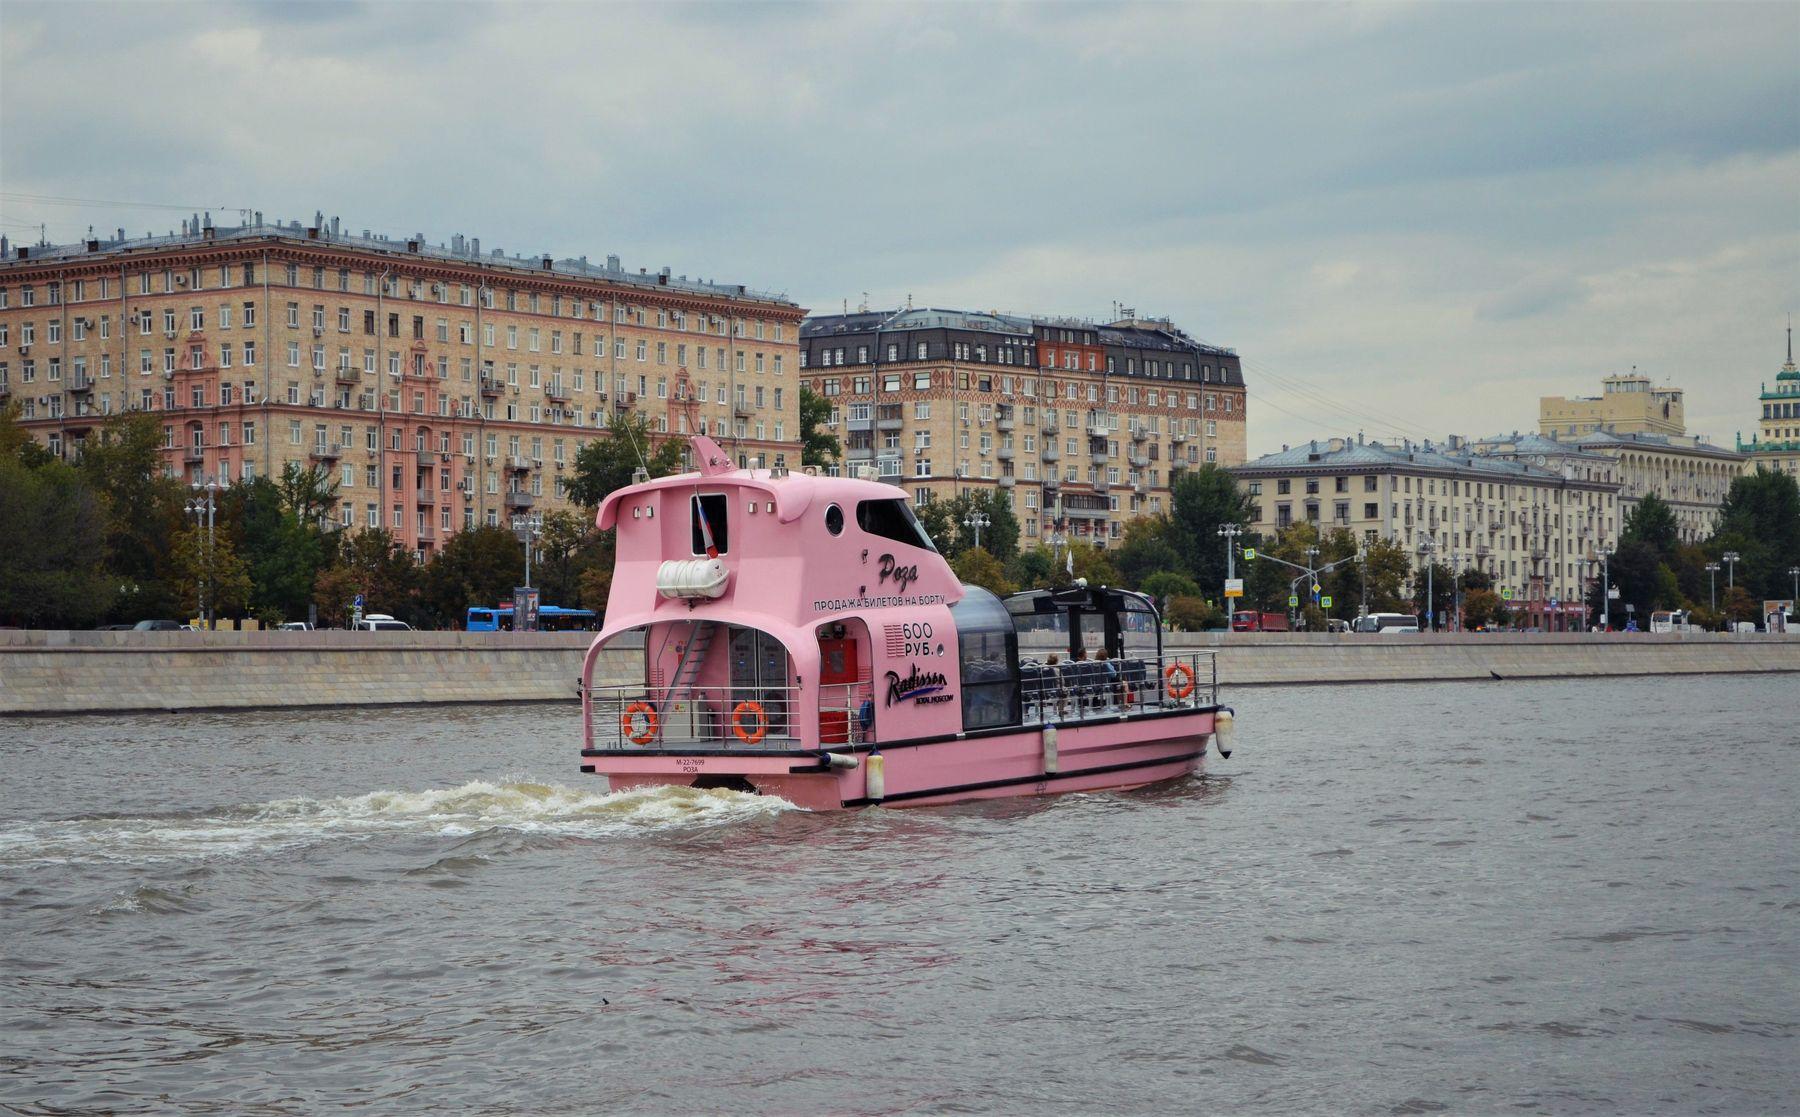 По Москве-реке... лето Москва Москва-река набережная город река путешествие